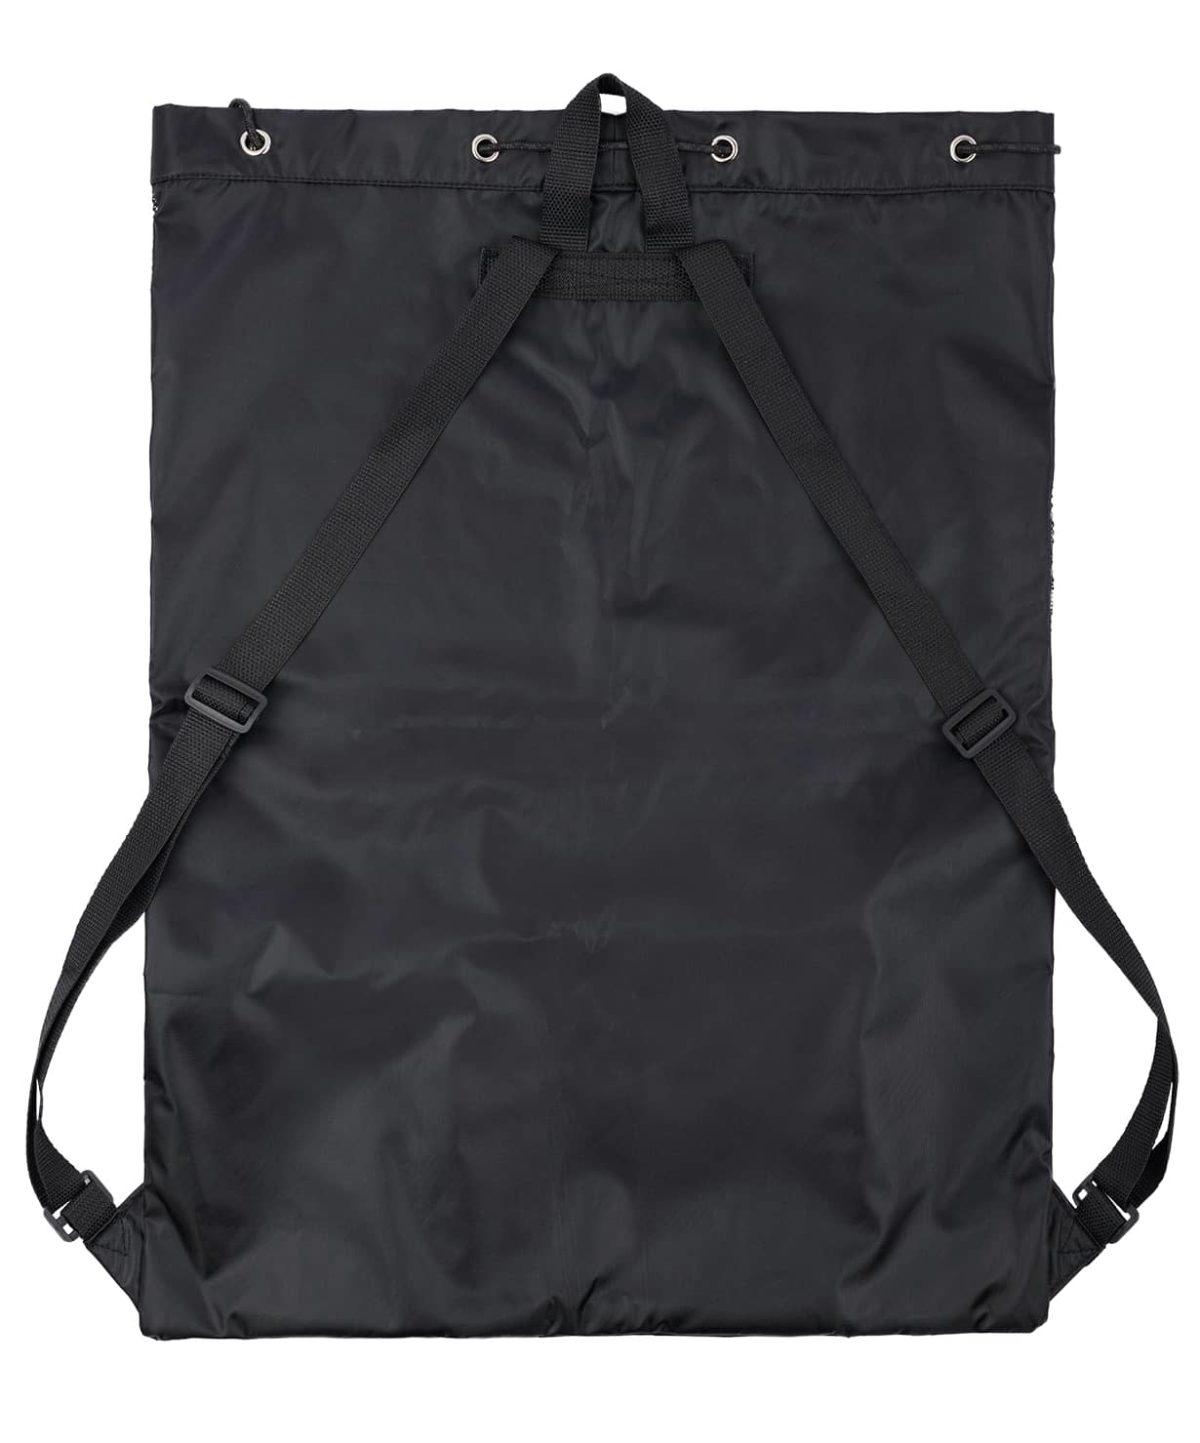 25DEGREES Рюкзак Maxpack  25D21015: чёрный - 2